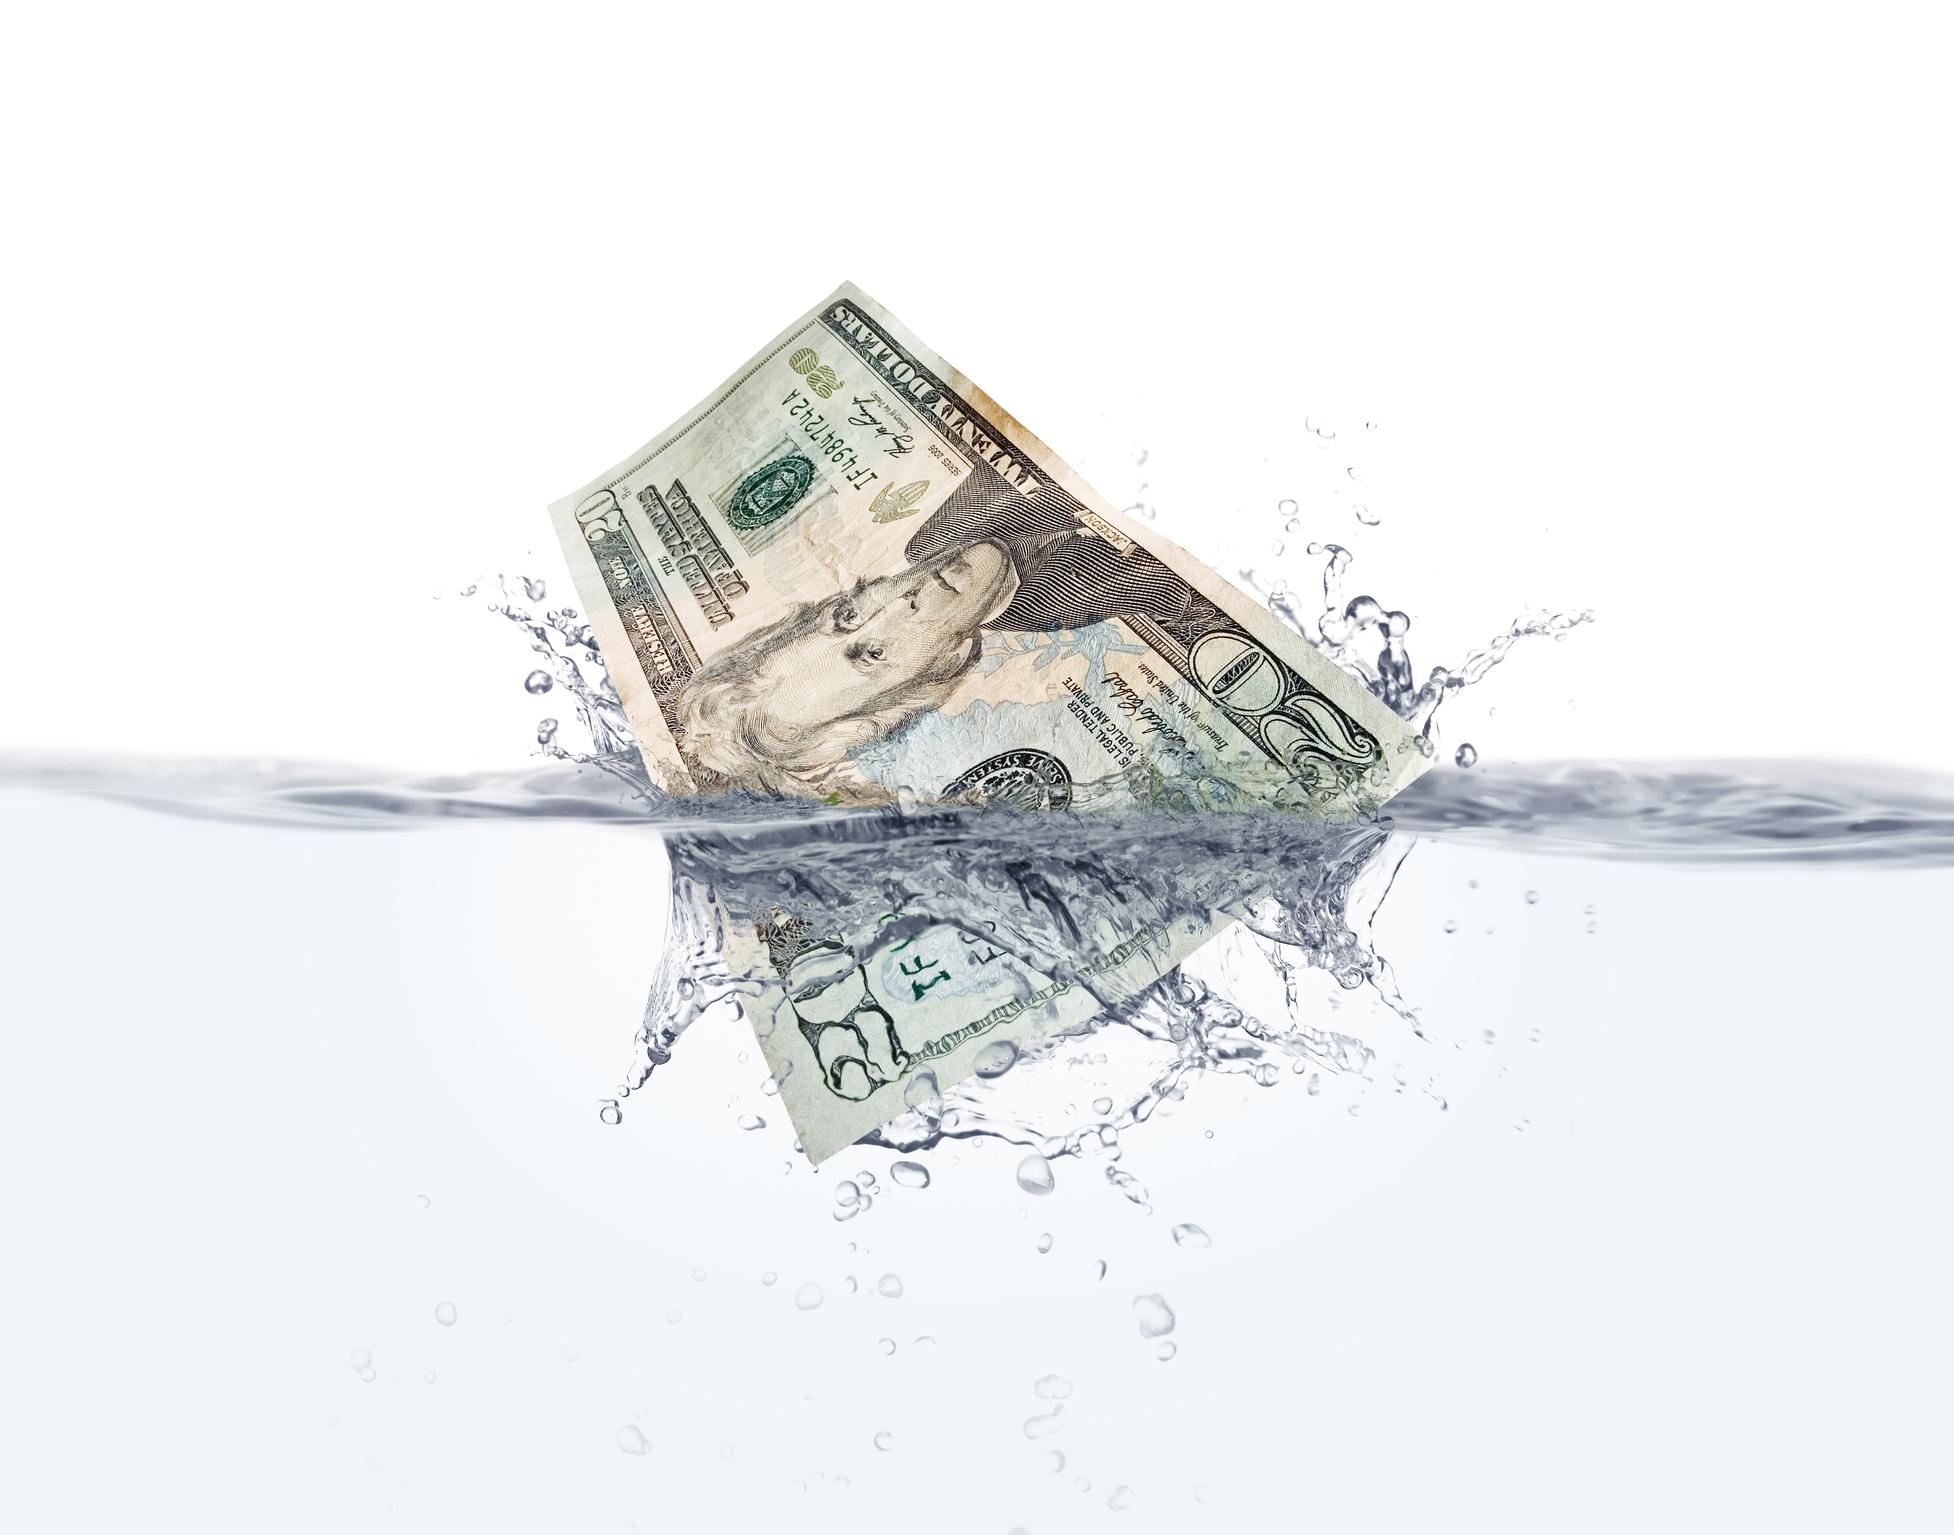 A twenty dollar bill splashing into the water.